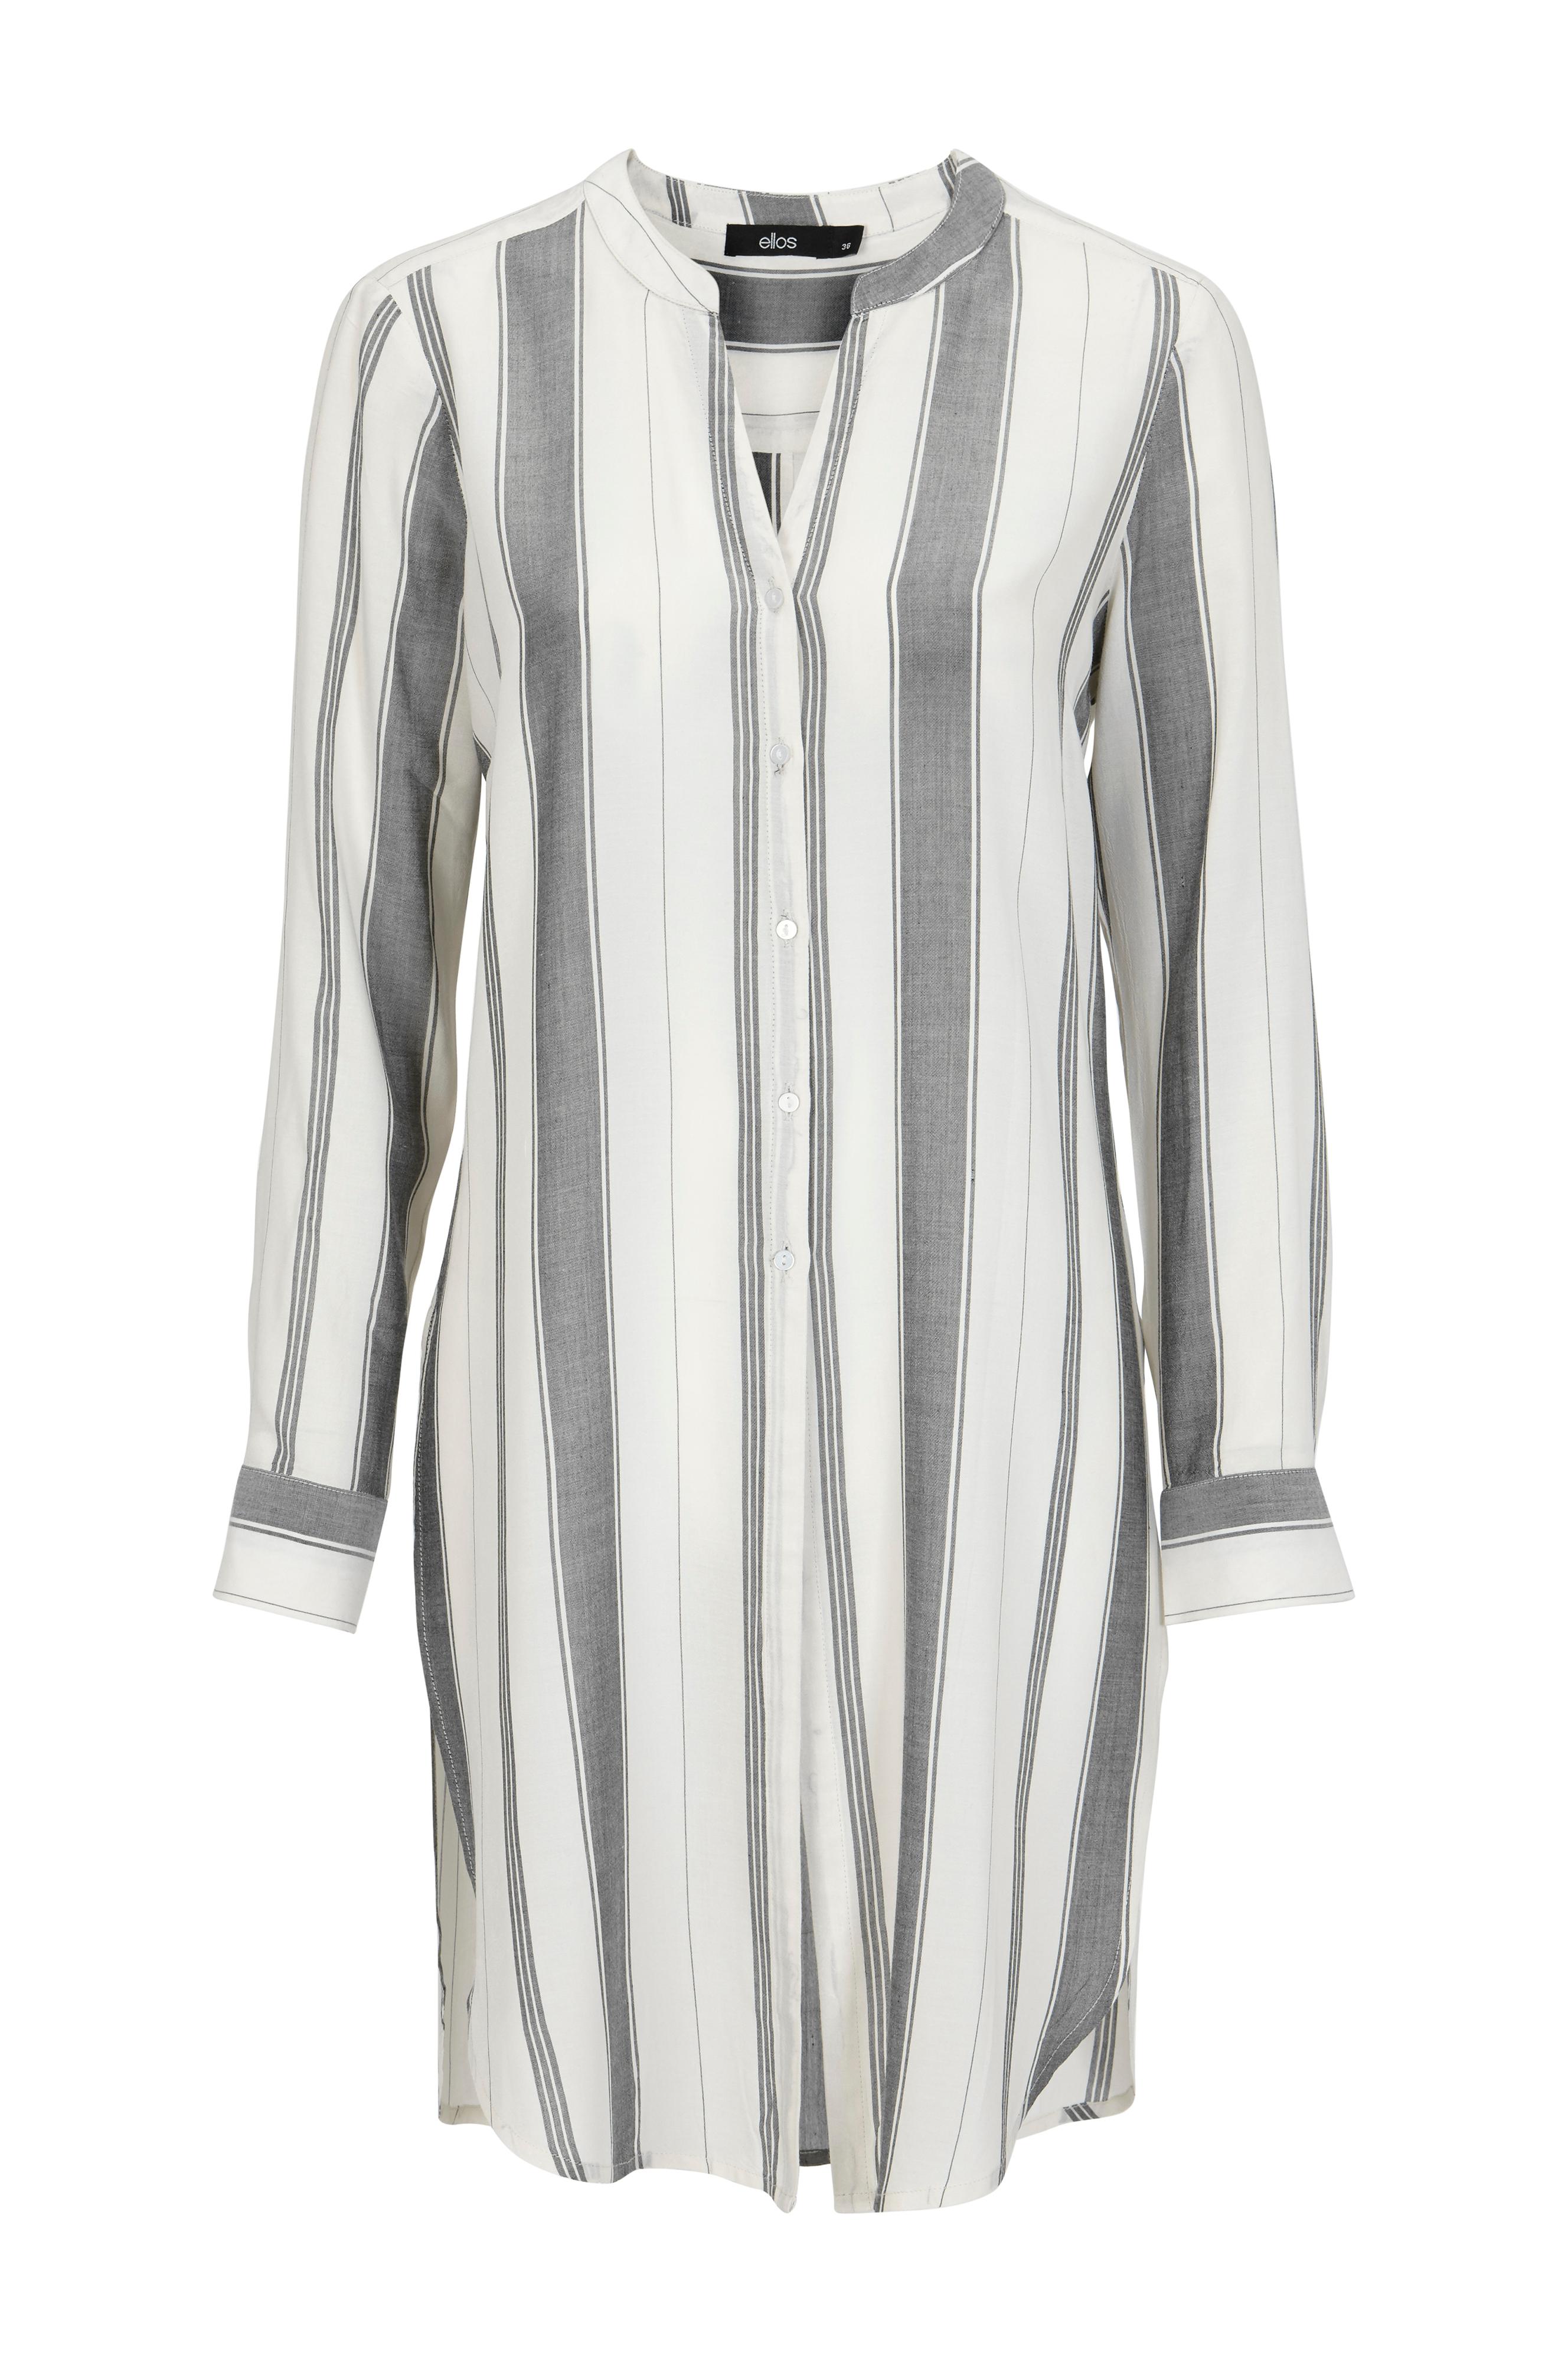 Ellos Collection Lang skjorte Emma Svart Skjorter Ellos.no